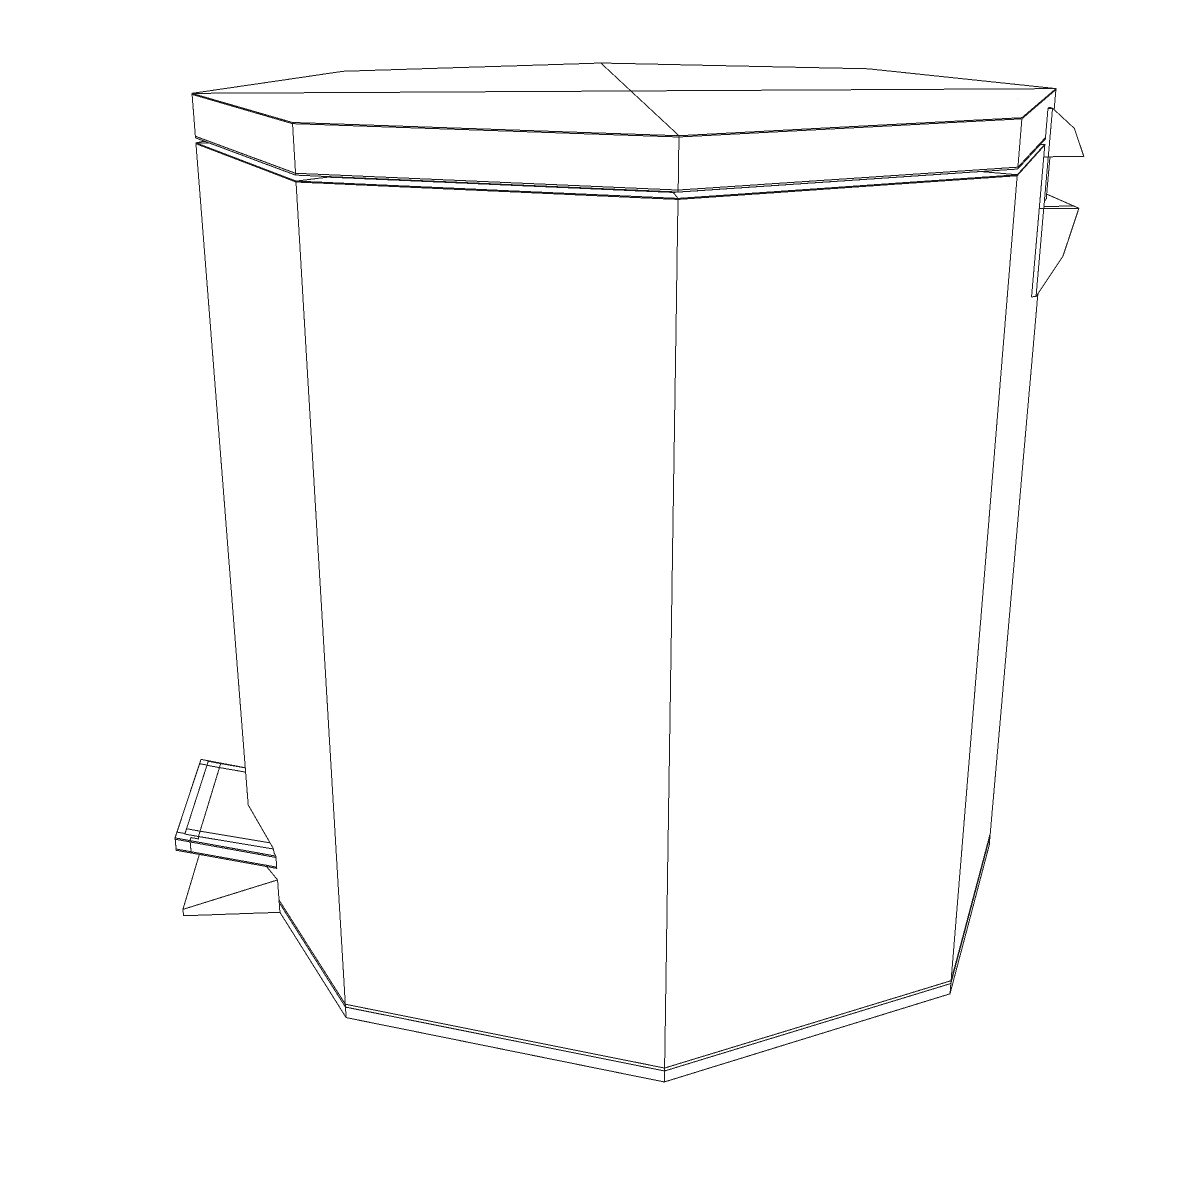 bathroom dumpster 3d model 3ds max fbx ma mb obj 155987